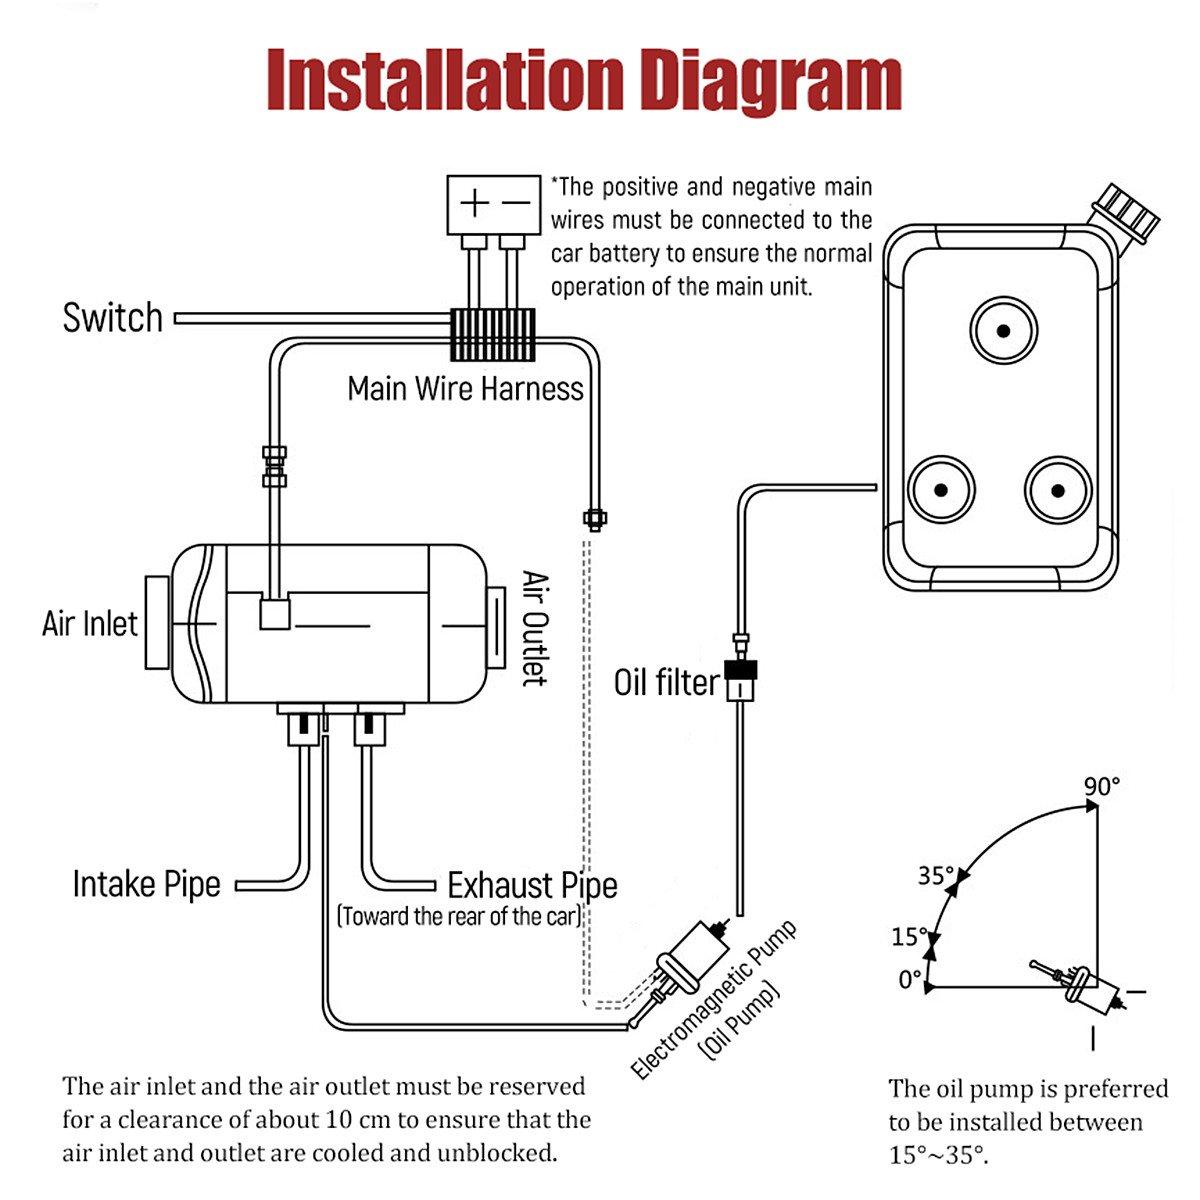 12v 2 2kw Diesel Air Heater Tank Vent Duct Digital